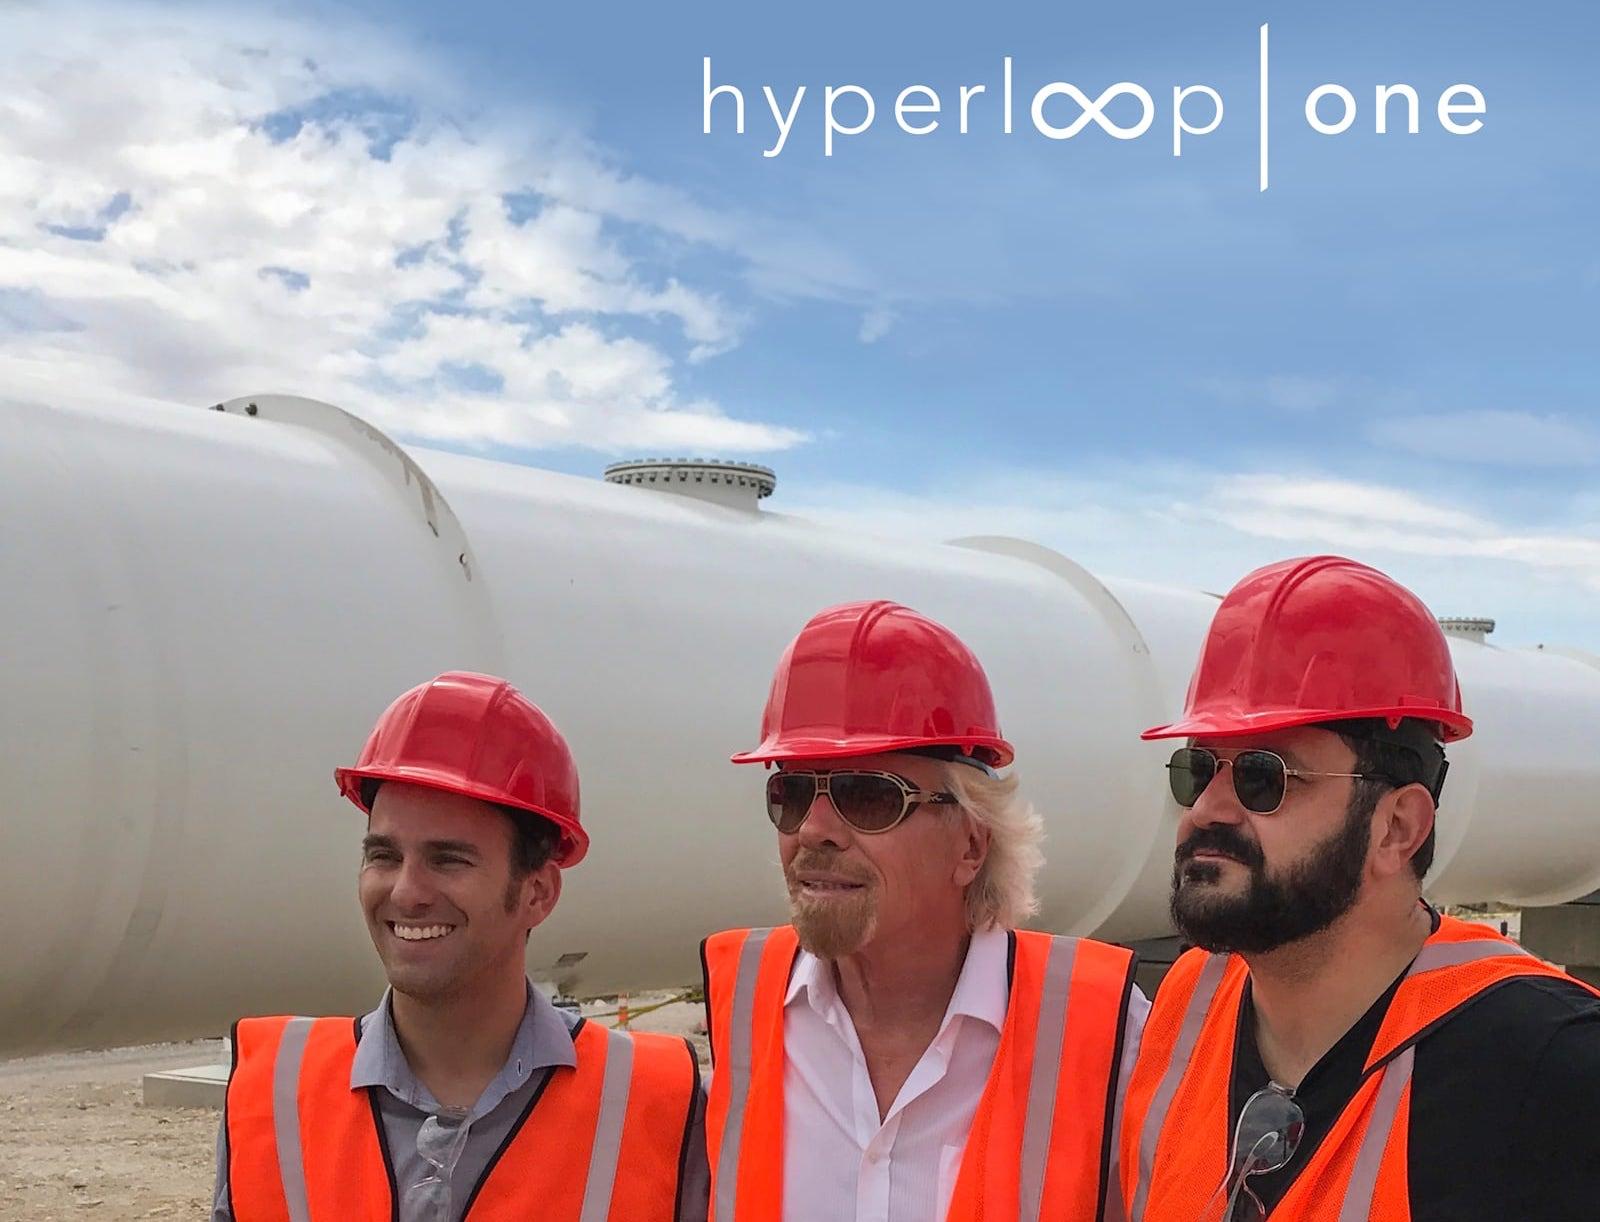 Hyperloop One becomes 'Virgin Hyperloop One' with Virgin Group investment